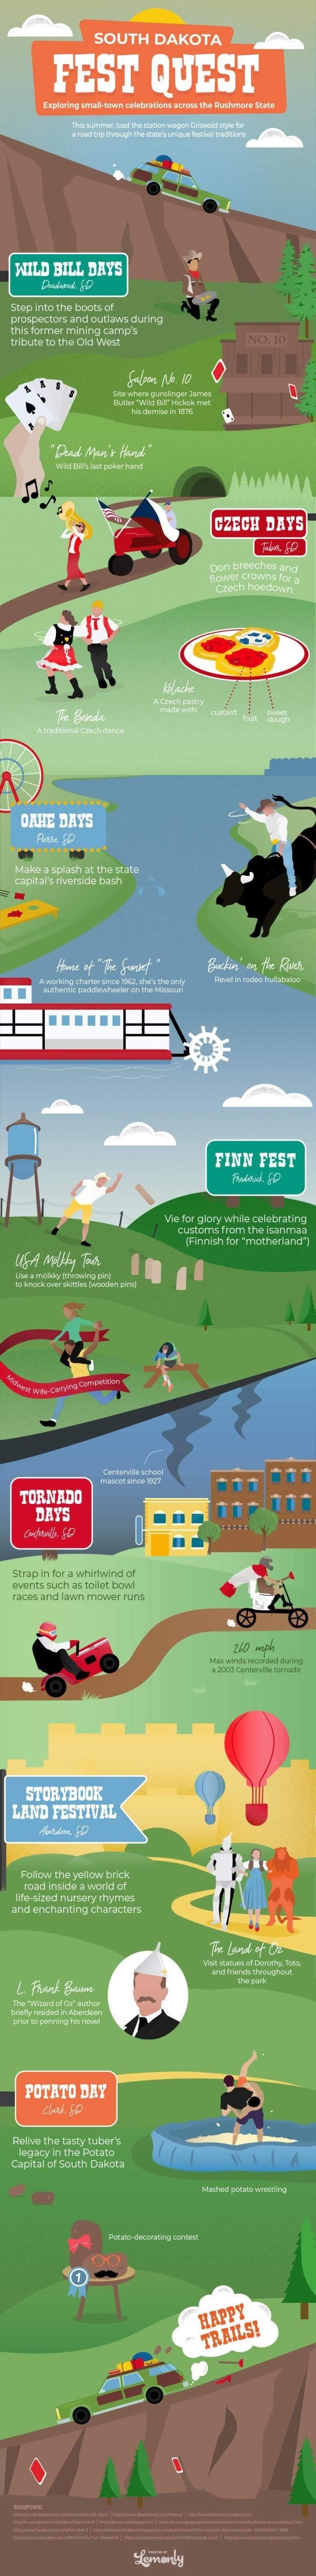 Summer South Dakota festivals #infographic